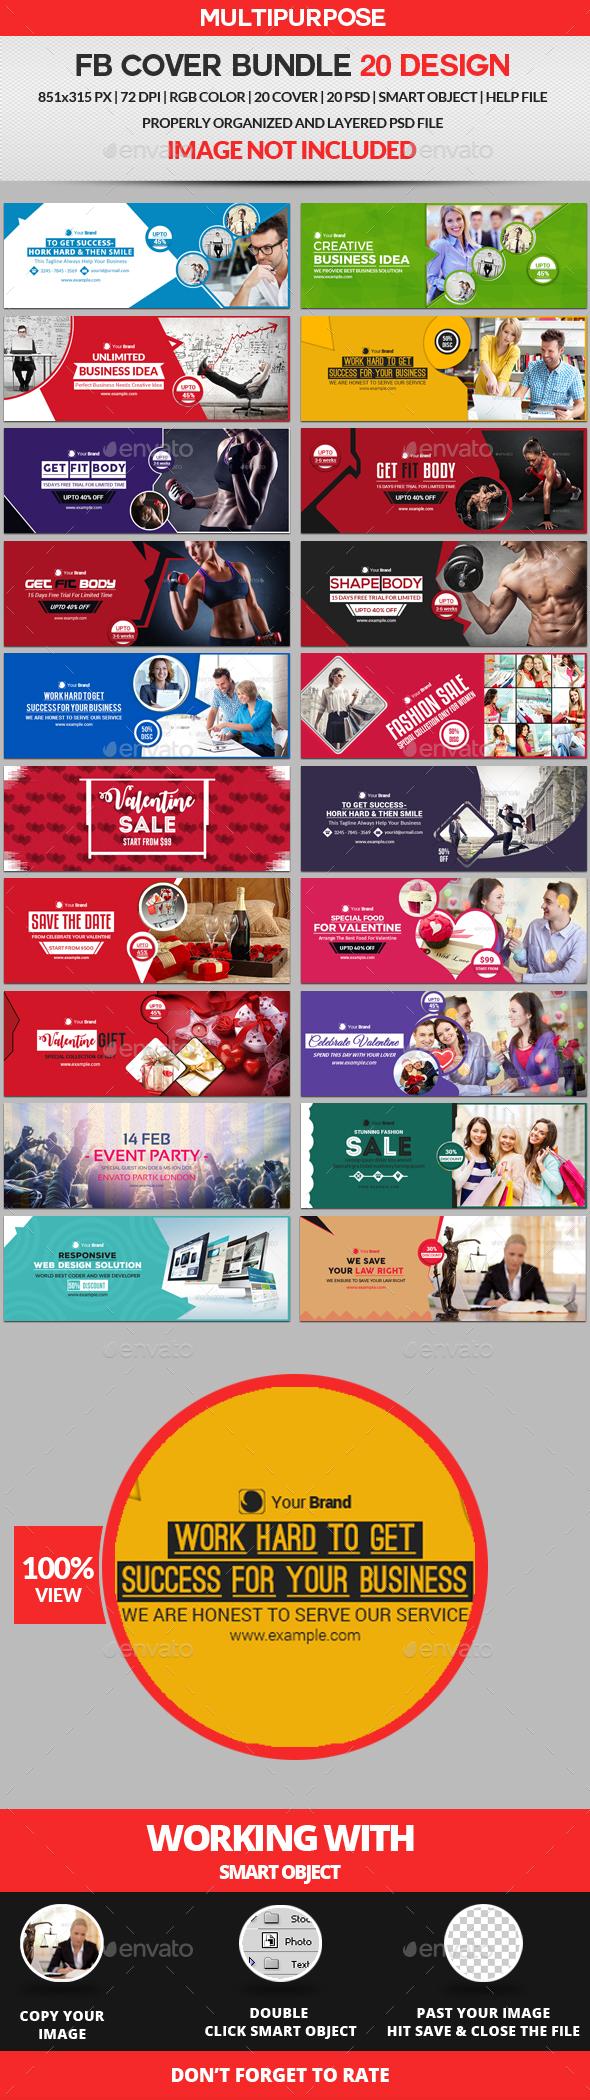 Facebook Cover Bundle Three - 20 Design - Facebook Timeline Covers Social Media